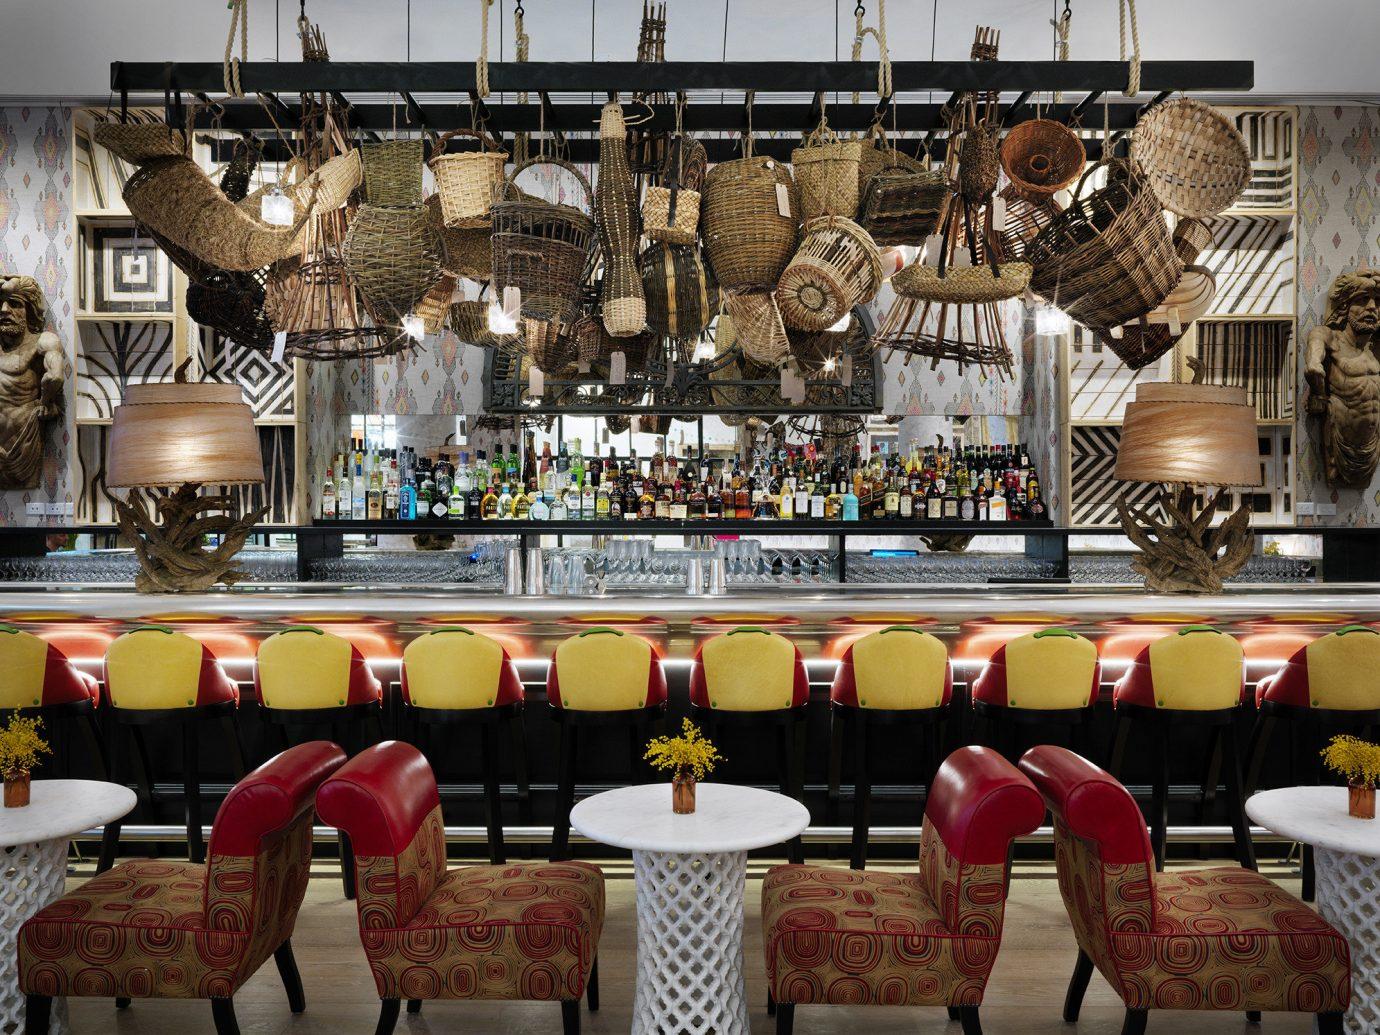 Hotels NYC indoor meal restaurant interior design furniture